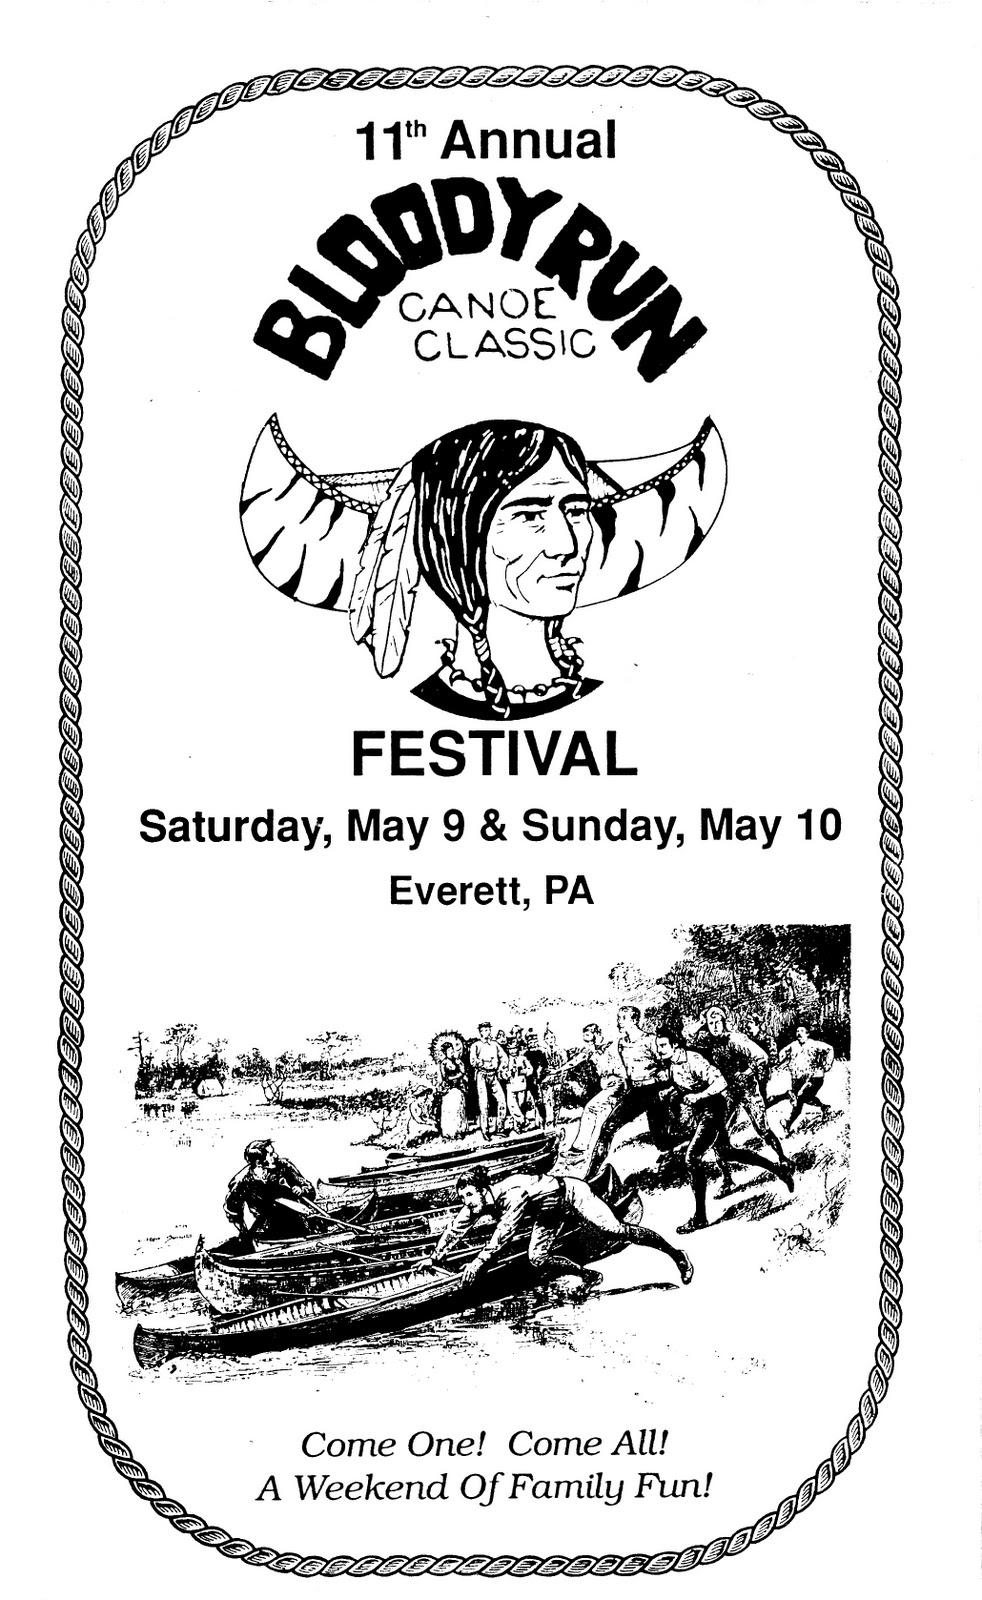 1992 Festival Guide Cover